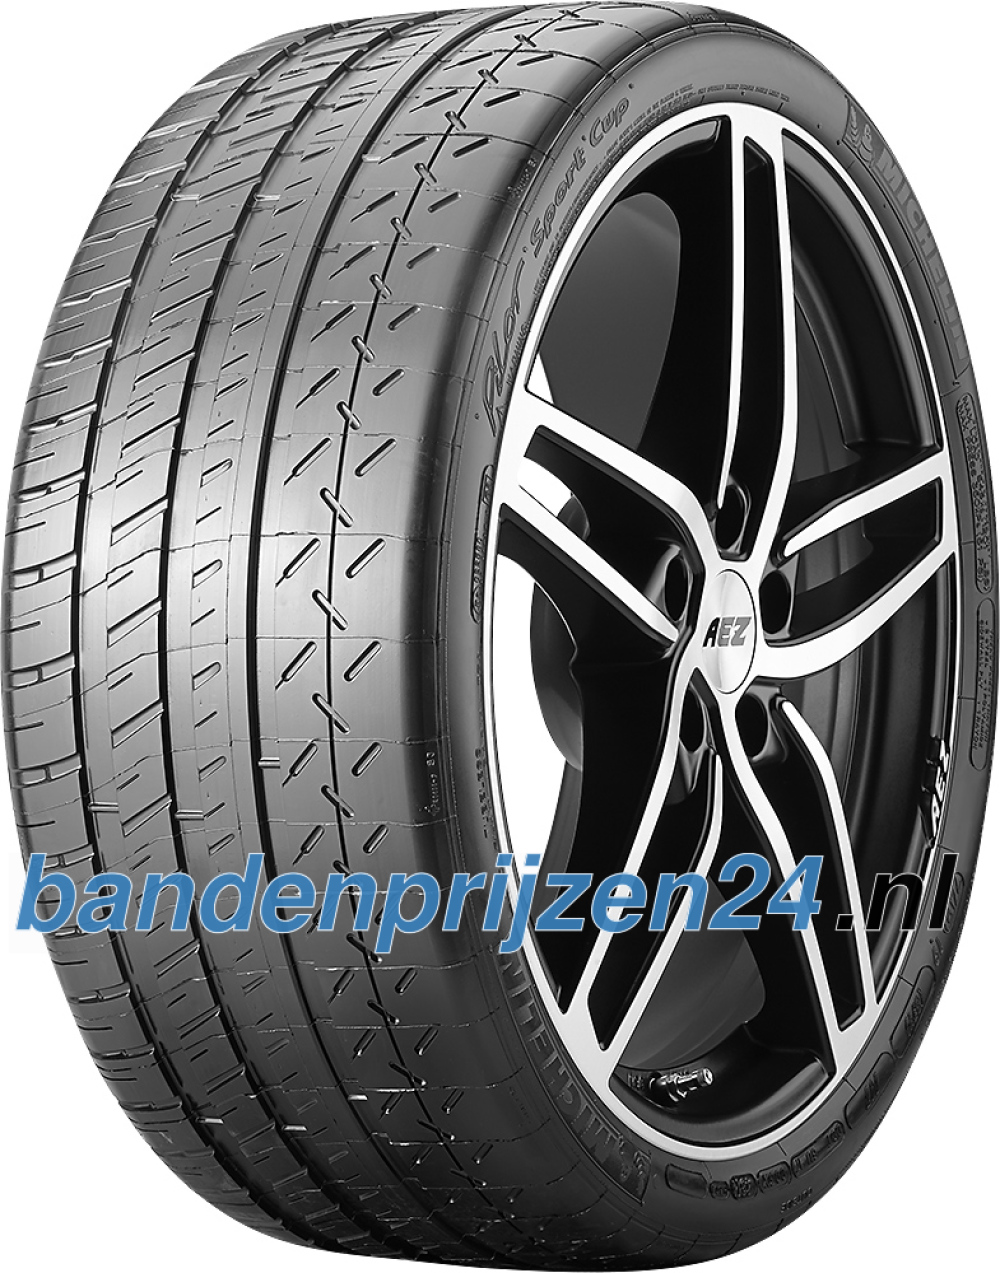 Michelin Pilot Sport Cup+ ( 325/30 ZR19 (101Y) N1 )